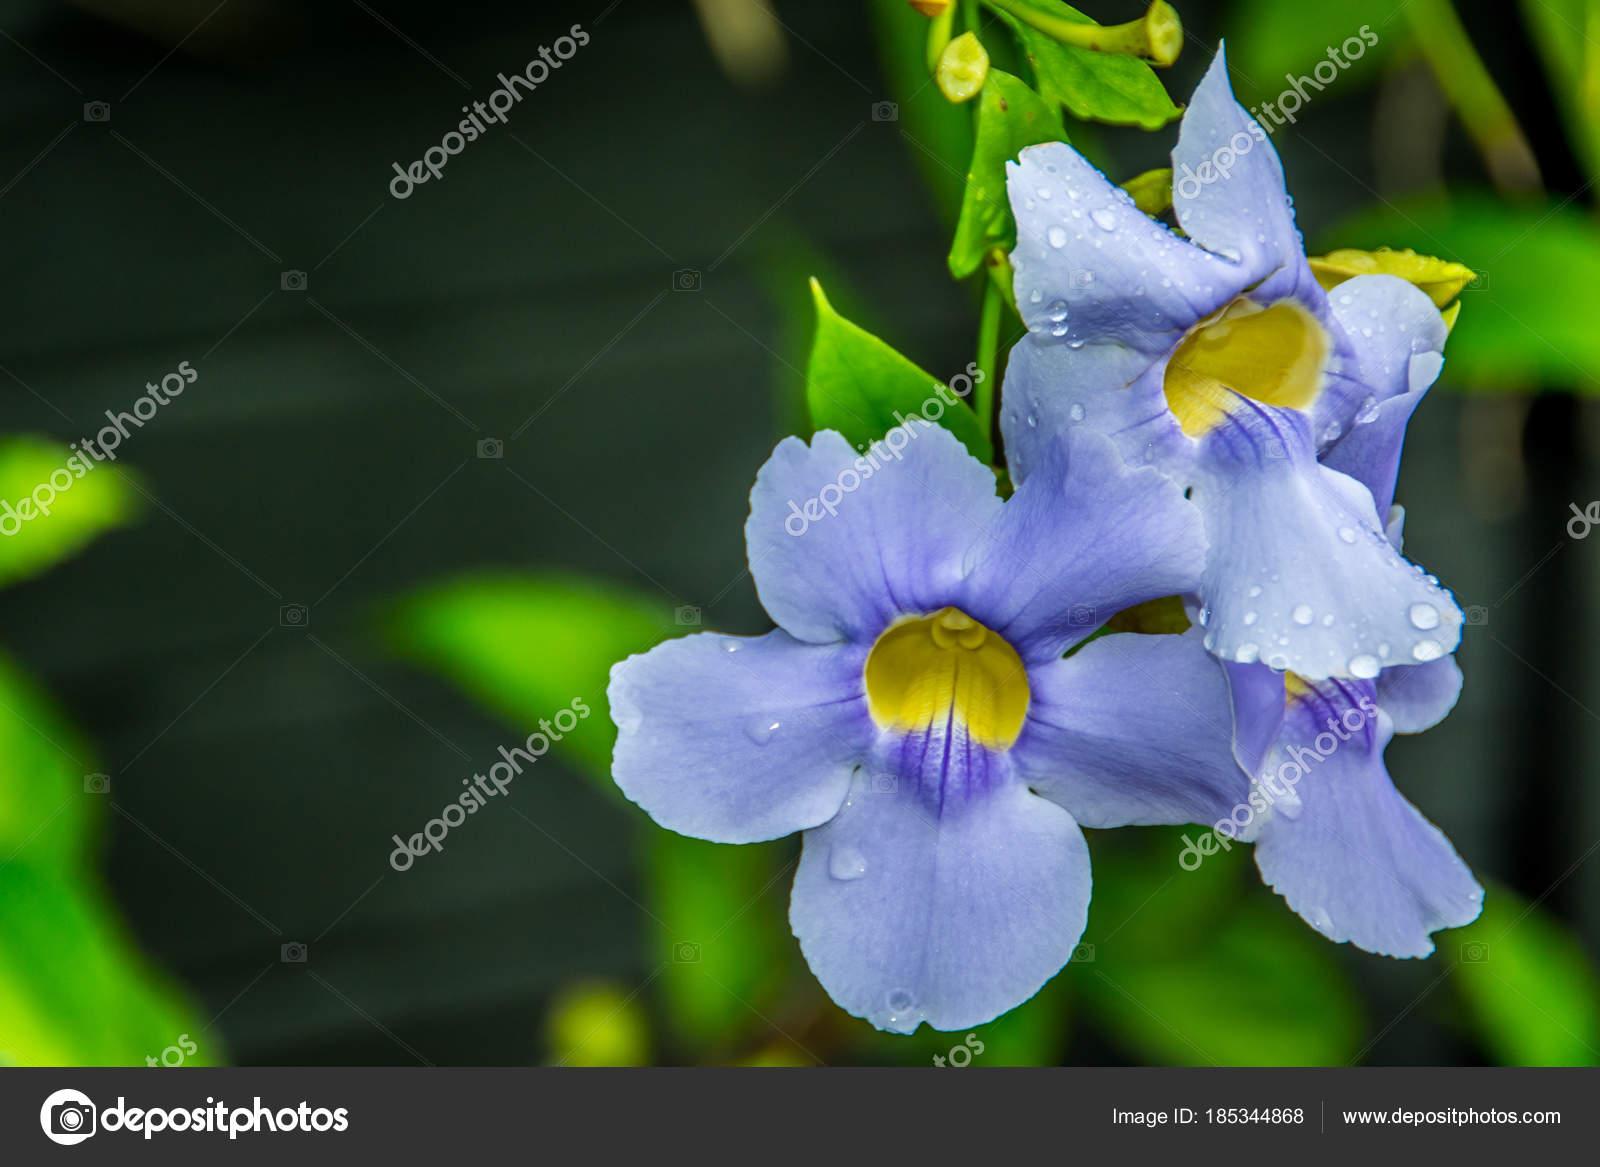 Beautiful blue trumpet vine bloom caribbean stock photo msbyer a beautiful blue trumpet vine bloom in the caribbean photo by msbyer izmirmasajfo